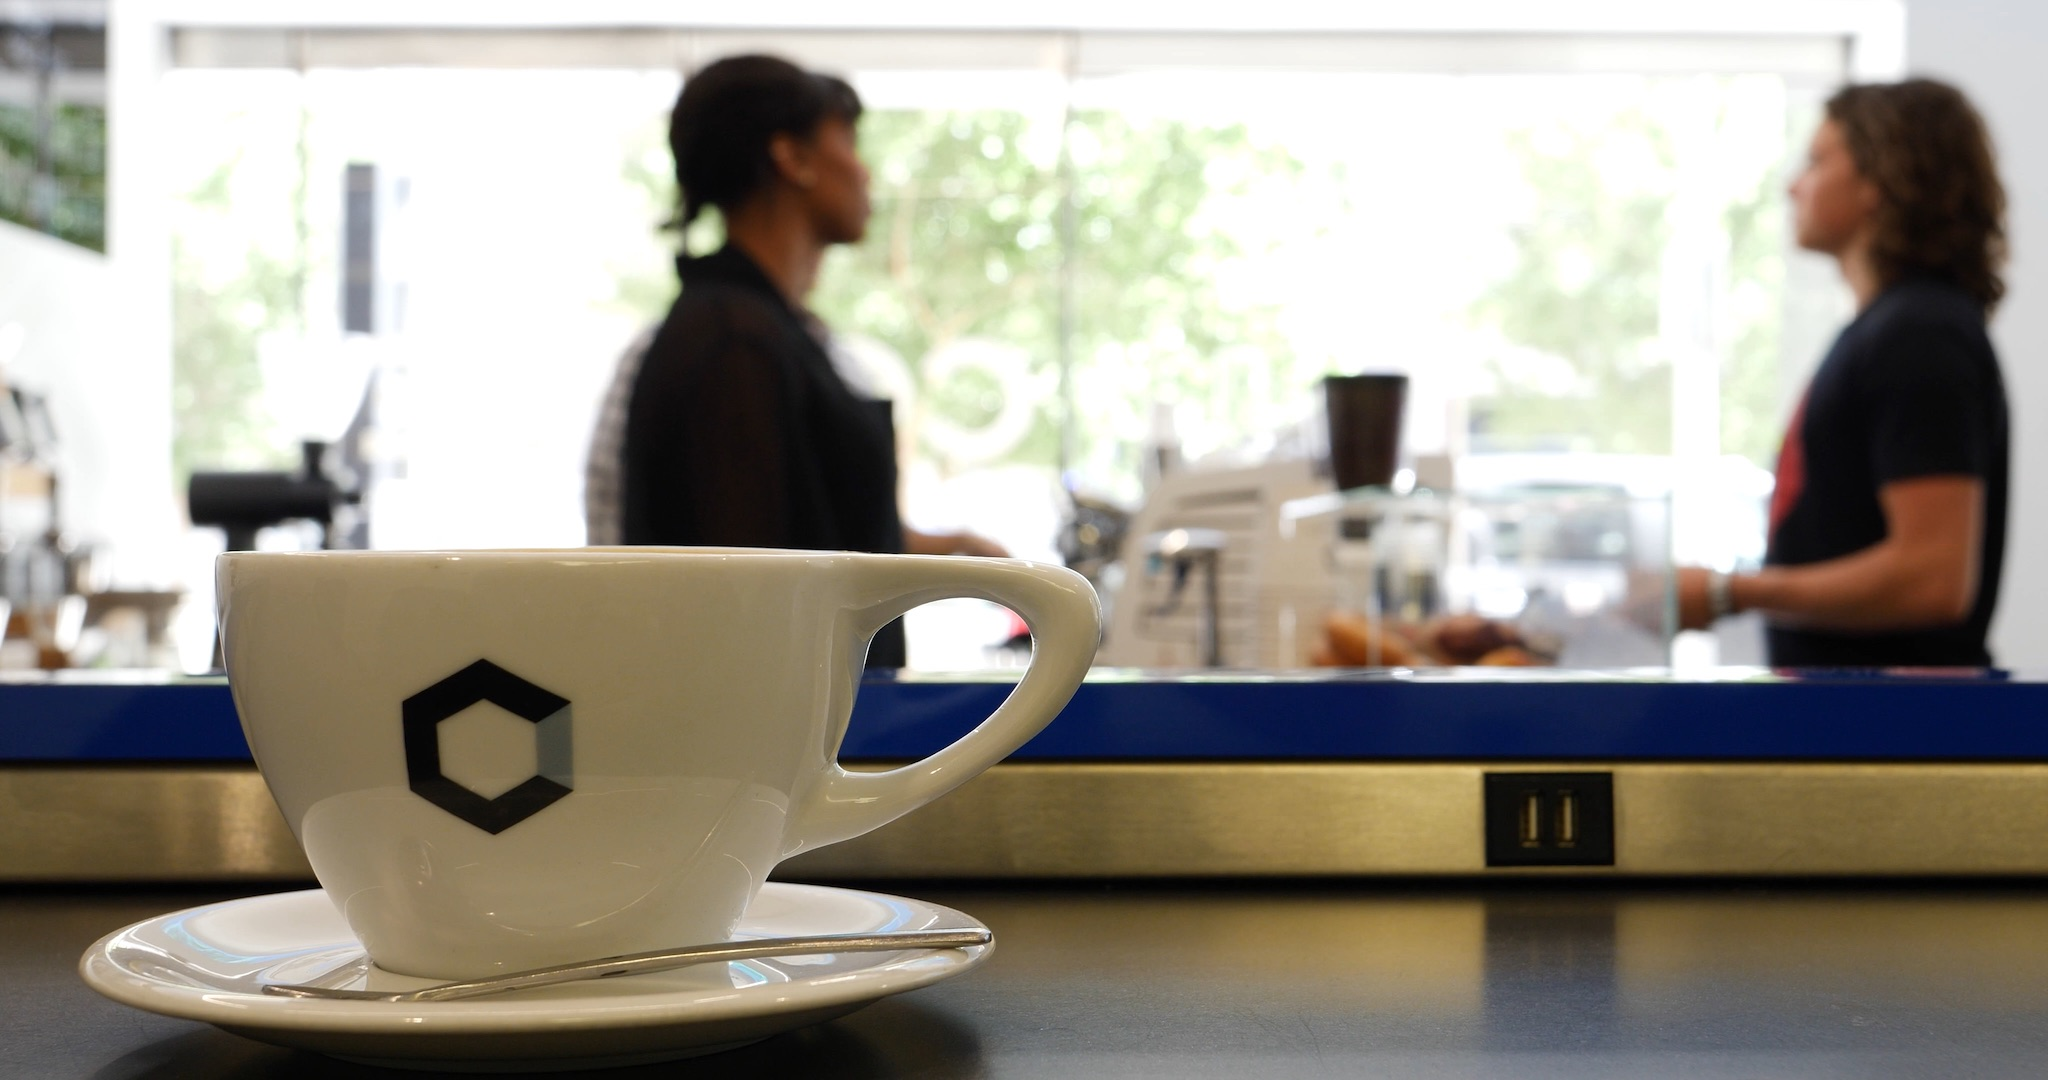 Coffee at Clarity Coffee - photo by Dennis Spielman